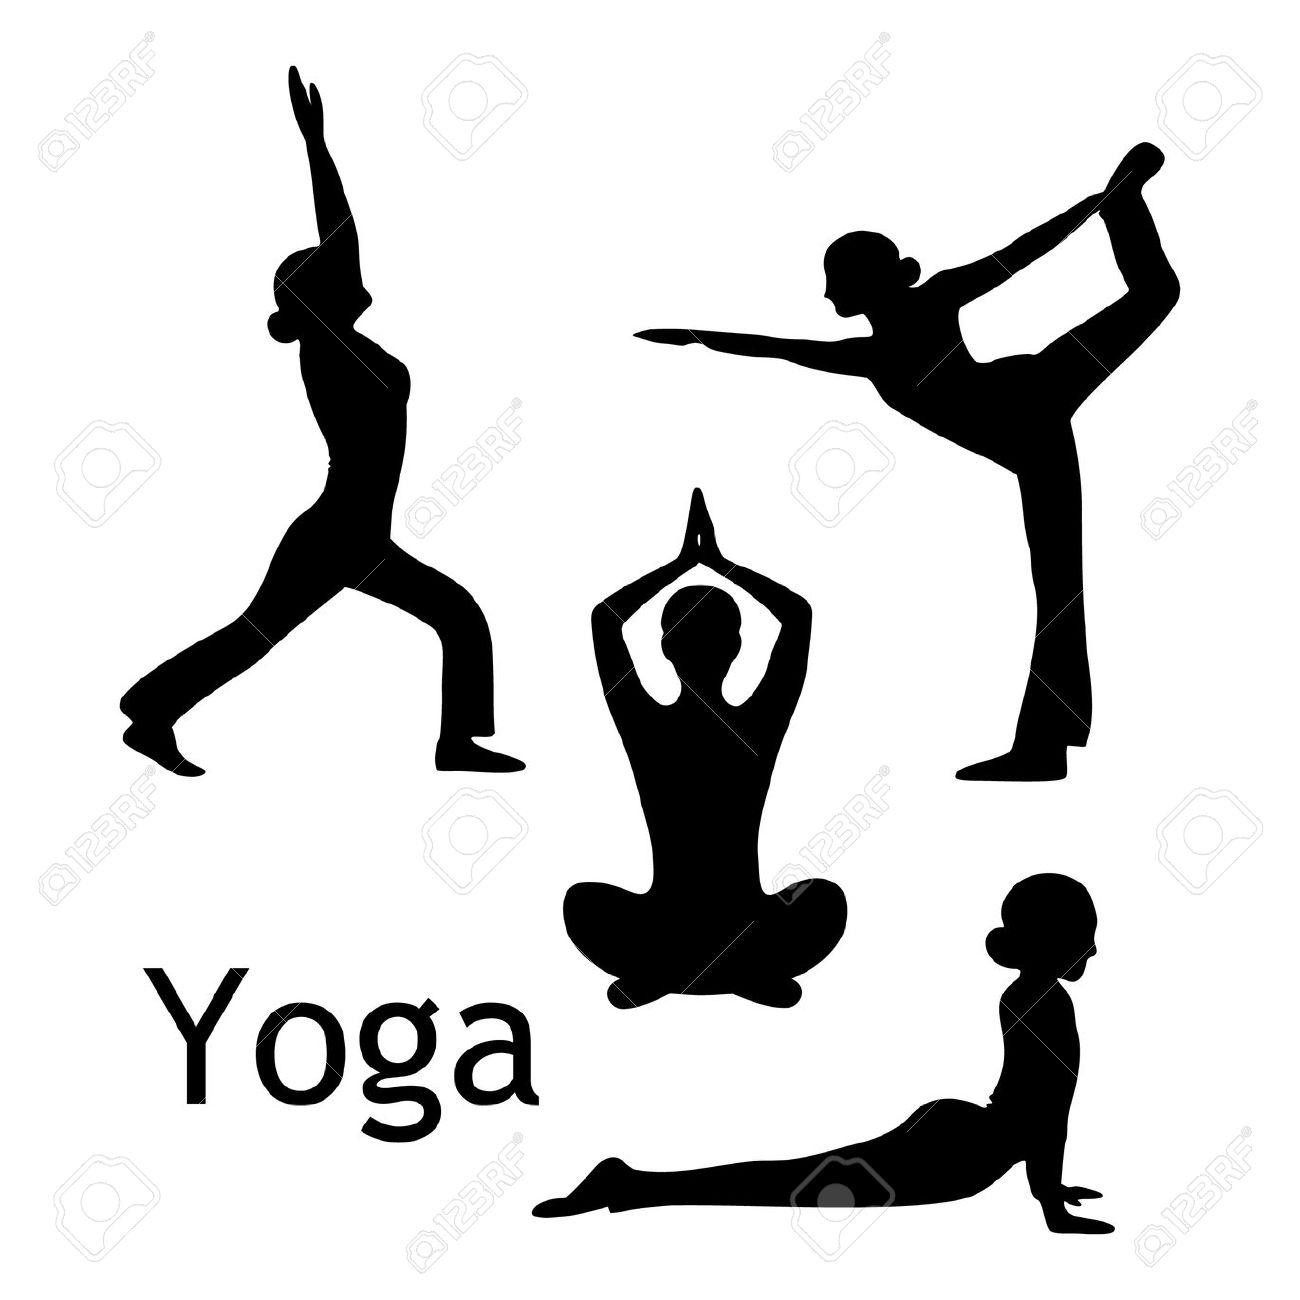 Yoga images clip art - .